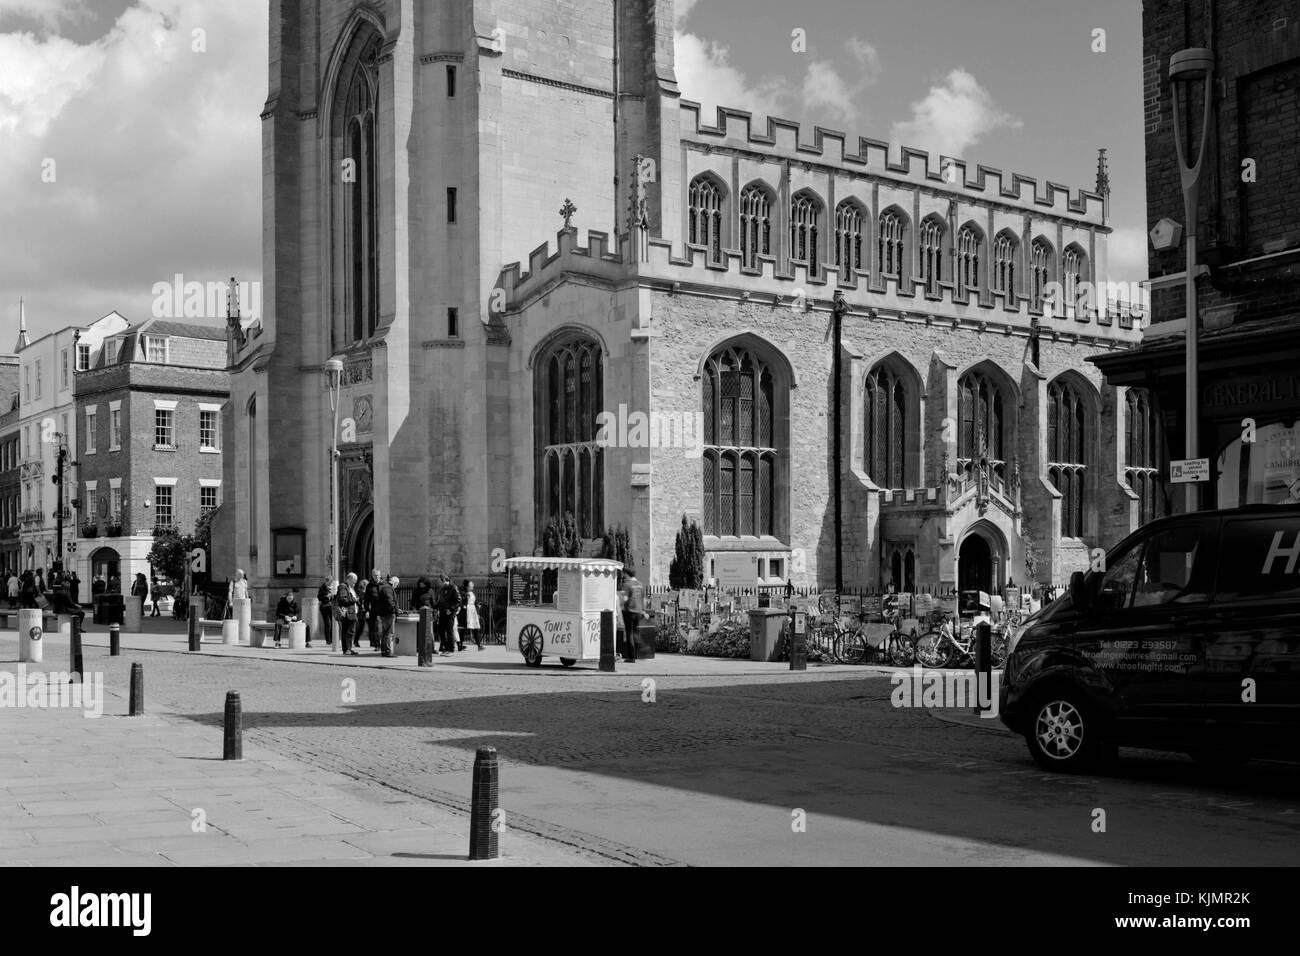 Great St Mary's Church on King's Parade Cambridge - Stock Image